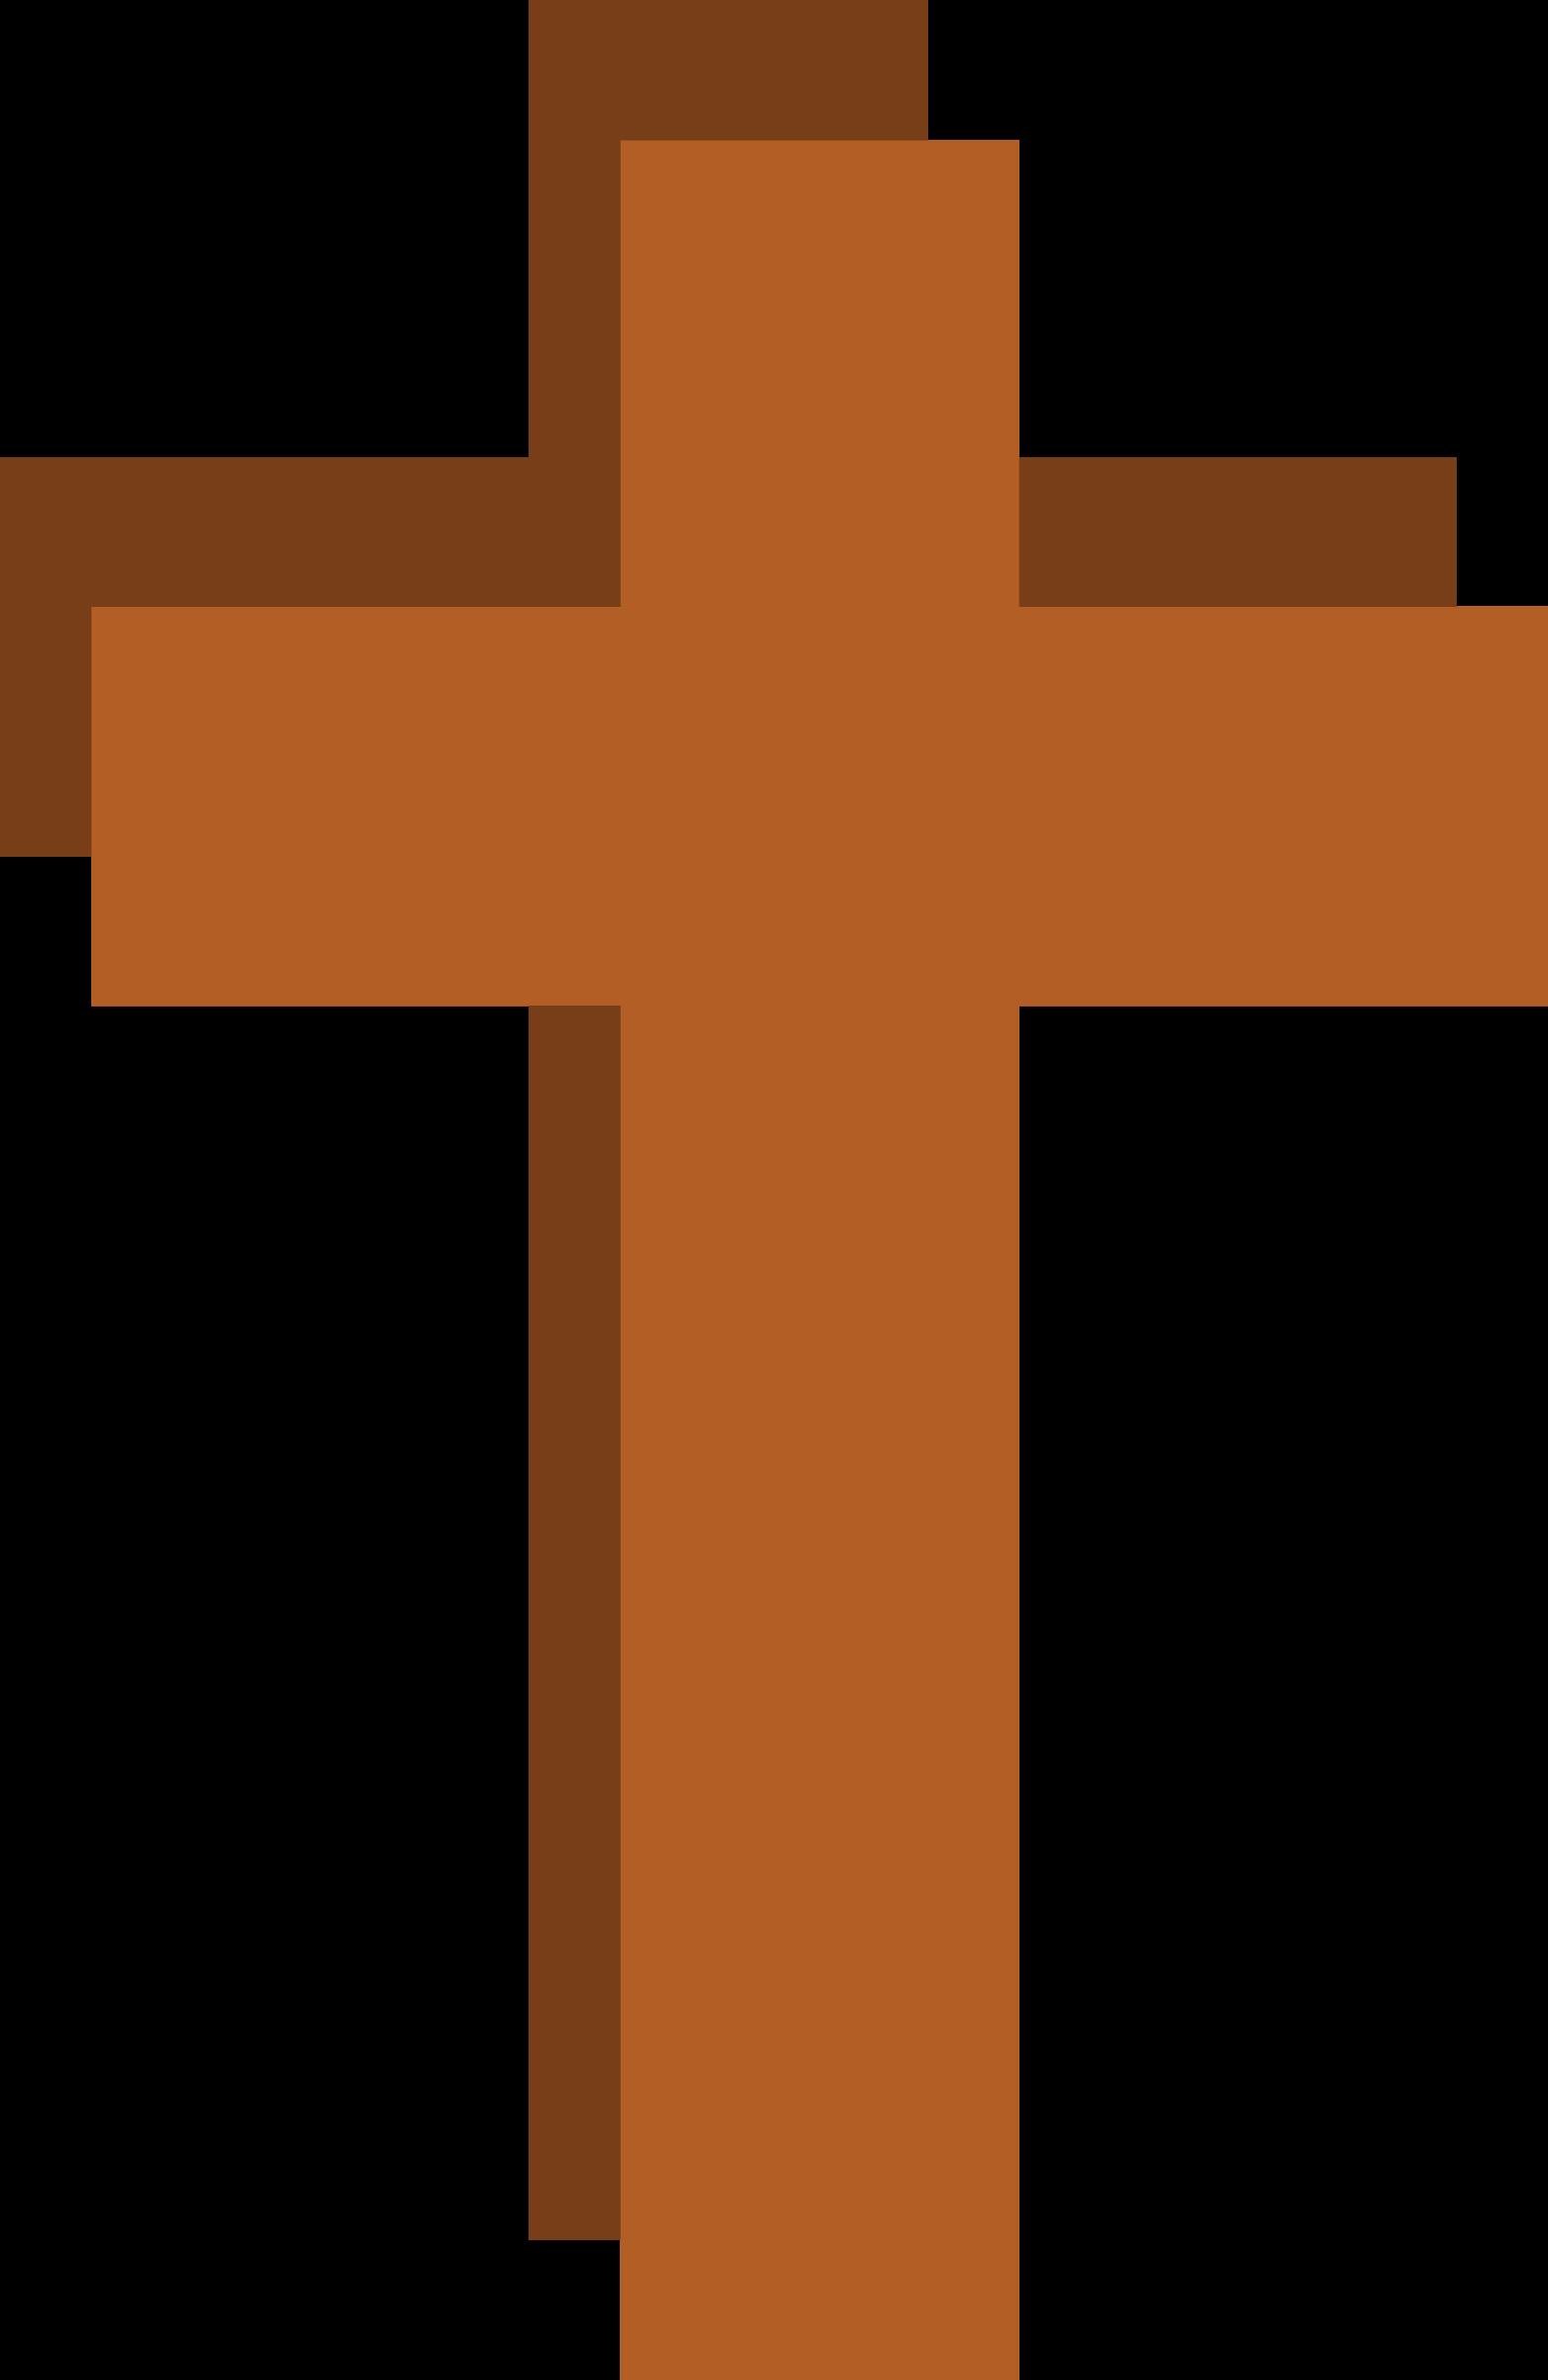 Crucifix clipart christianity. Stylized christian cross big